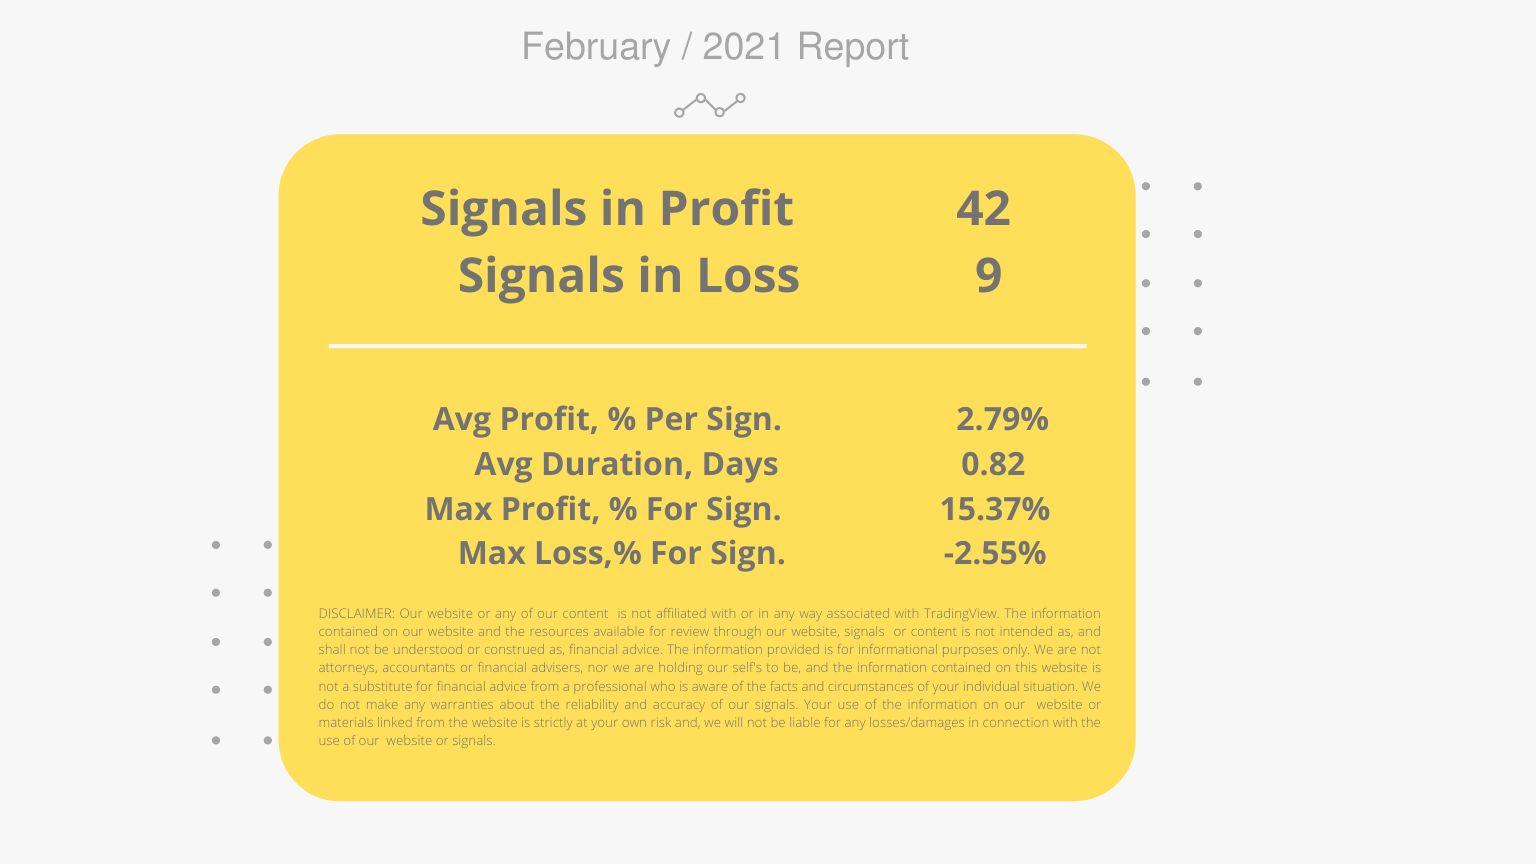 Average Profit, % Per Signal 3.91% Average Duration, Days 3.56 Max Profit, % For Signal 33.17% Max Loss,% For Signal -1.24% (1).png